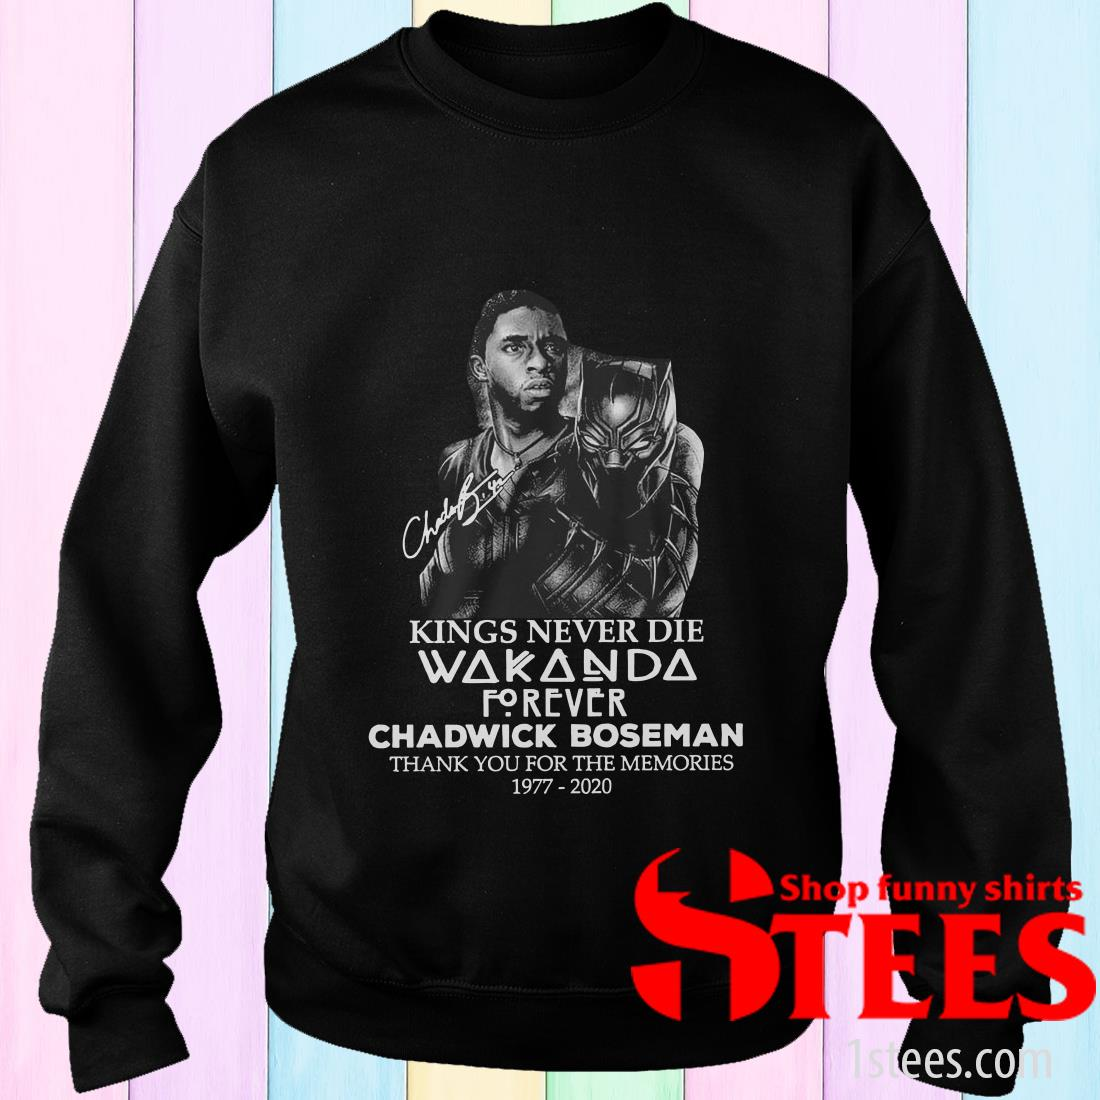 Kings Never Die Wakanda Forever Chadwick Boseman Thank You For The Memories 1977-2020 Sweatshirt